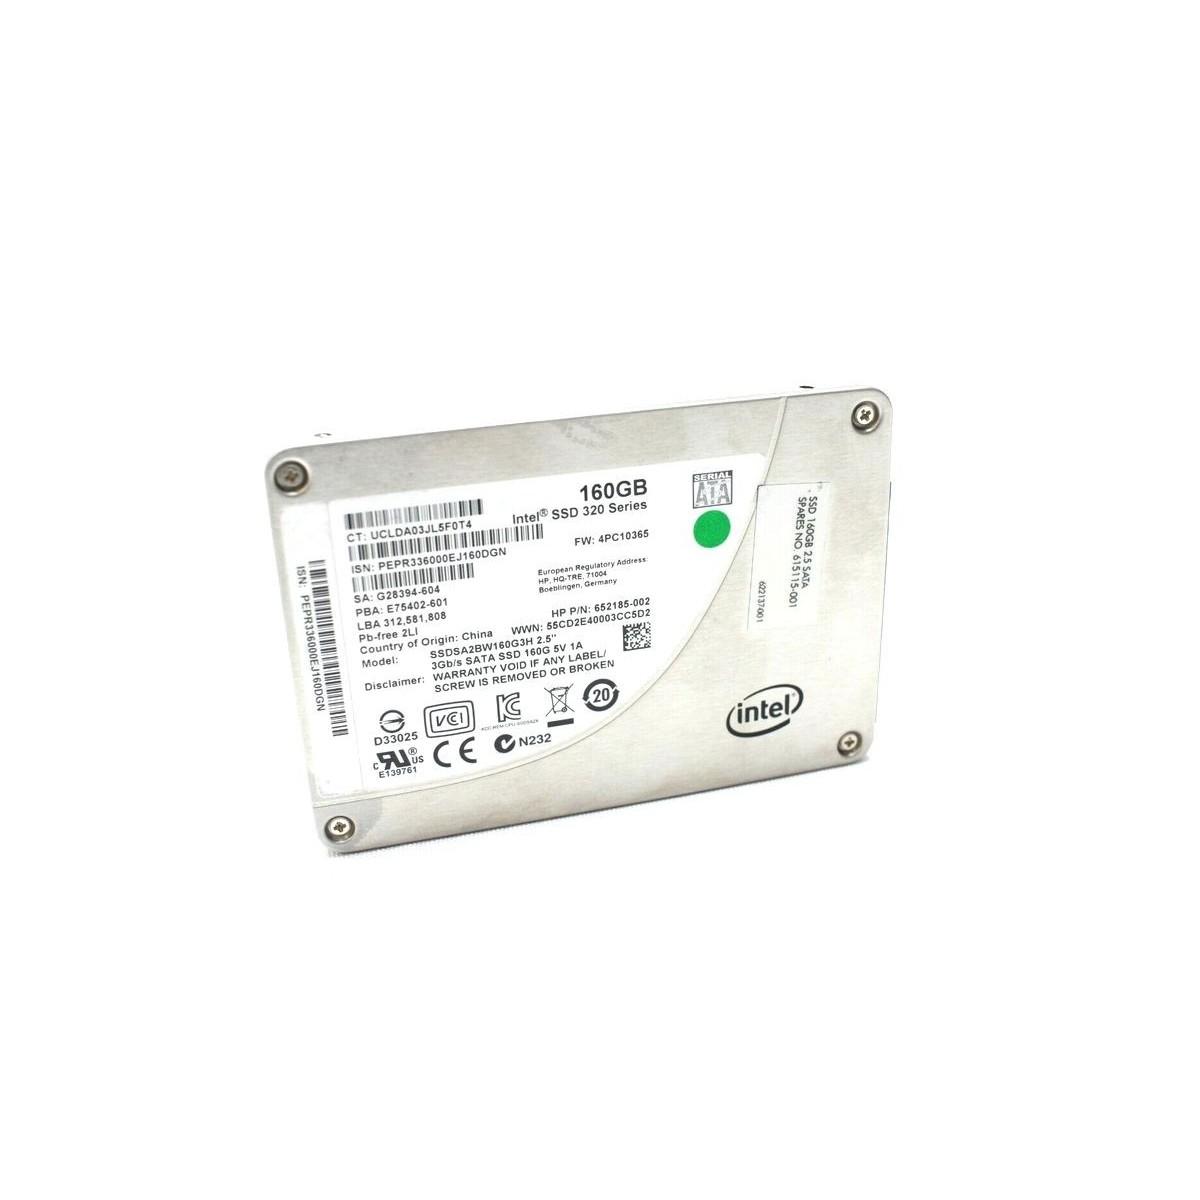 Szyny rack HP DL360 G2 G3 310619-001 252228-001